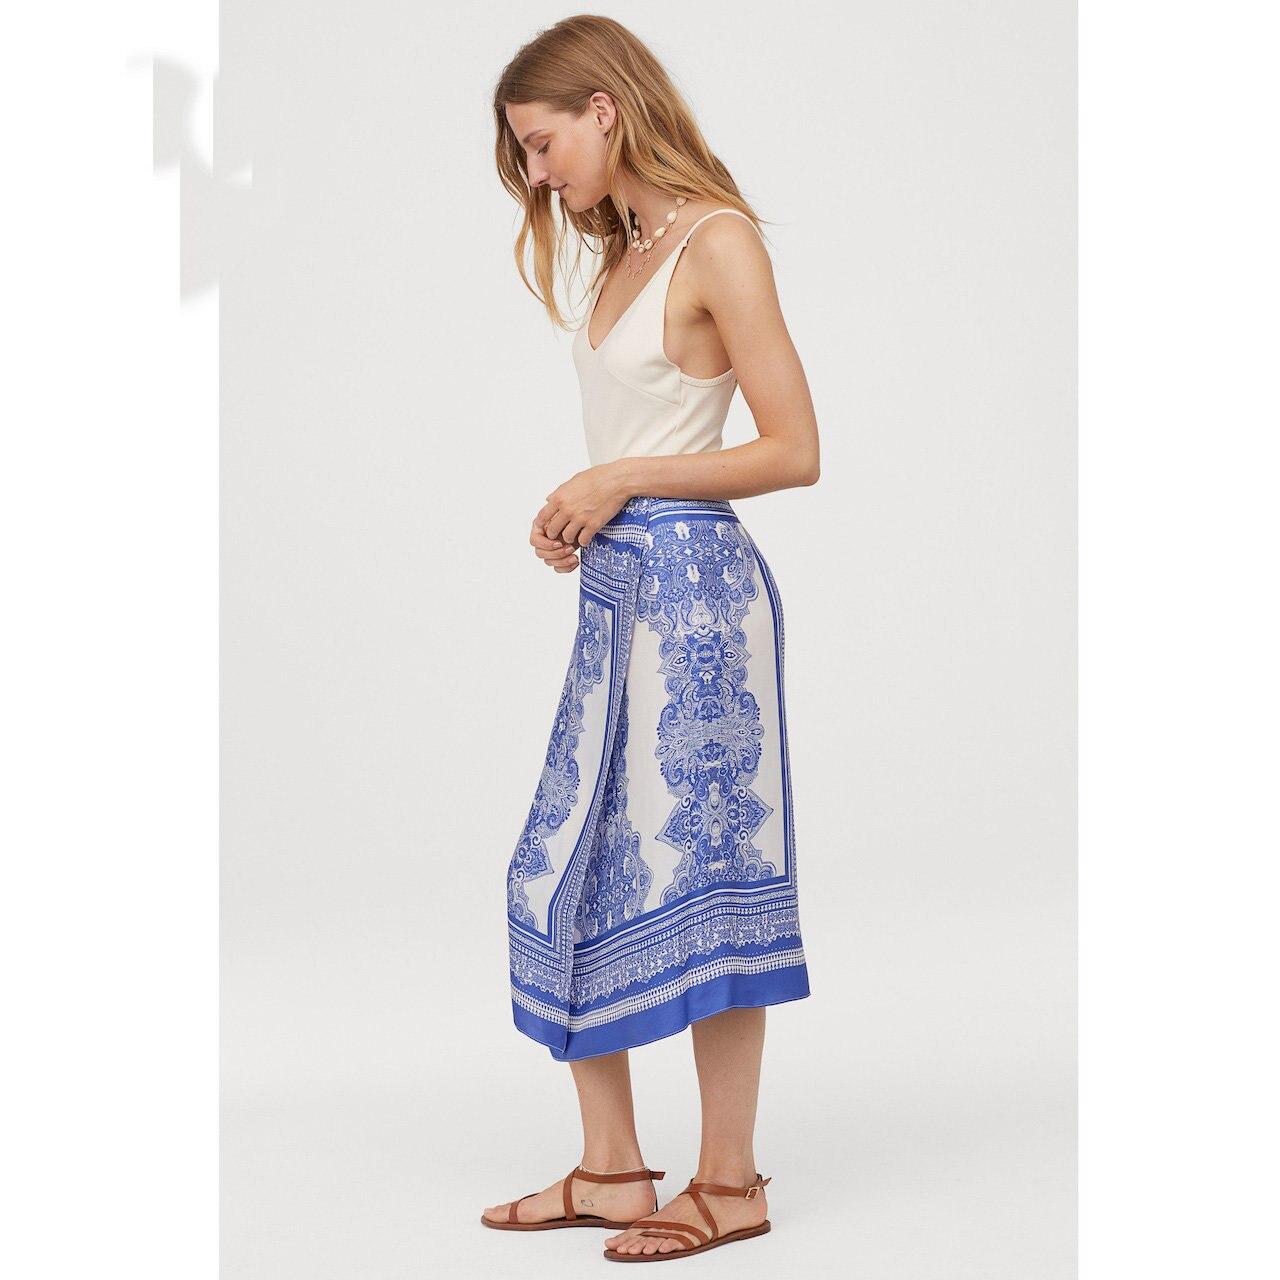 Western Style 2019 Summer New Style WOMEN'S Dress Elegant Versatile Slimming French Wrap-Style Satin Win Skirt